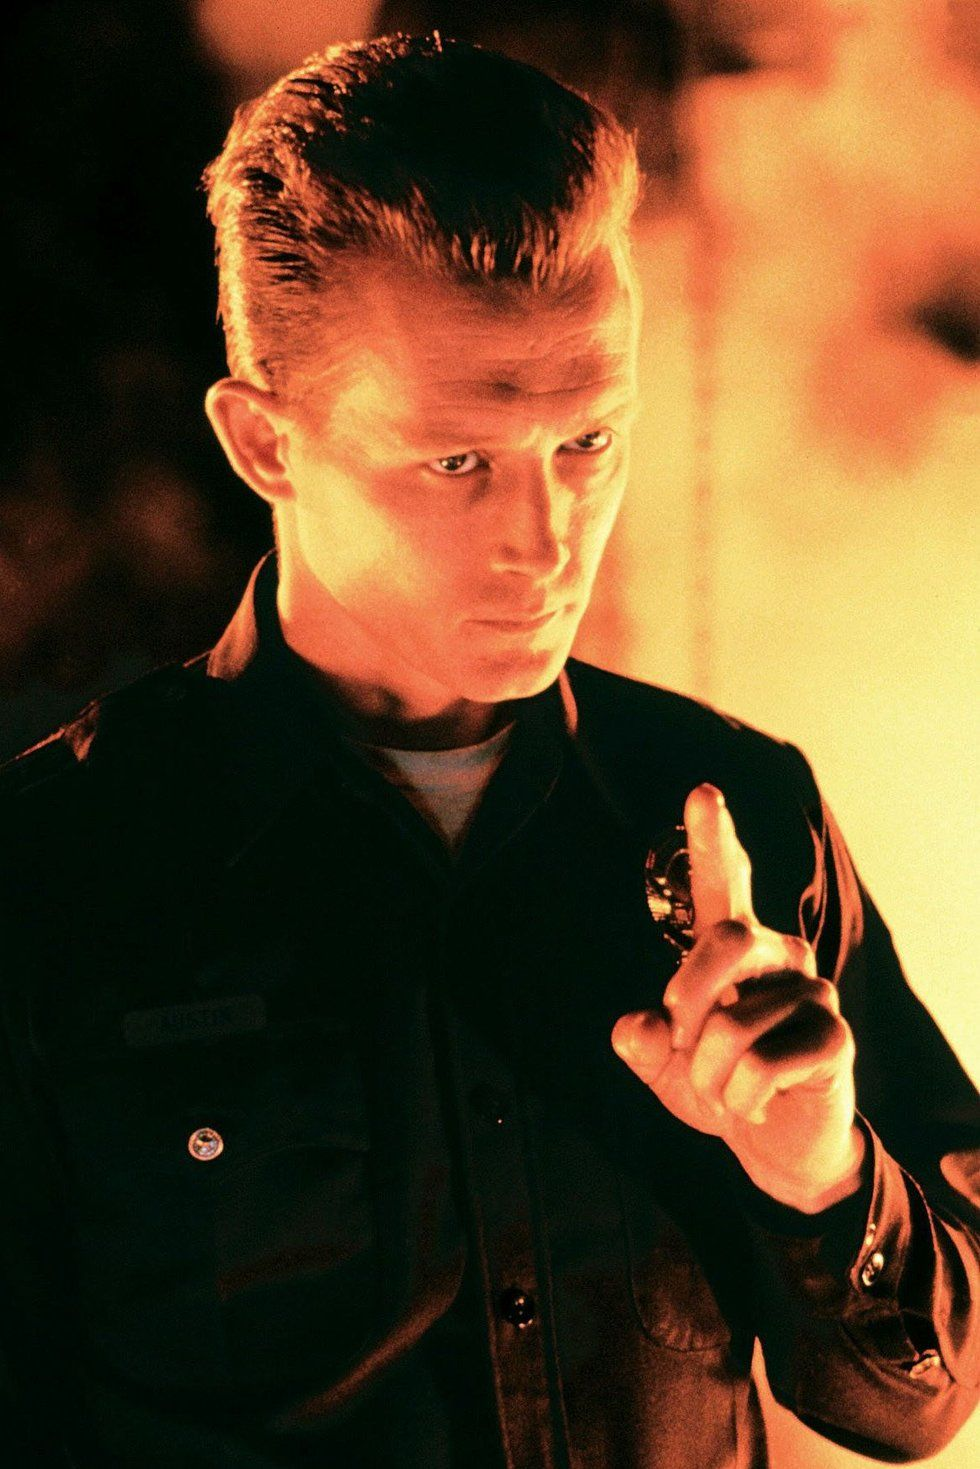 T 1000 Terminator ... 1000 origin terminator 2 judgment day occupation terminator powers